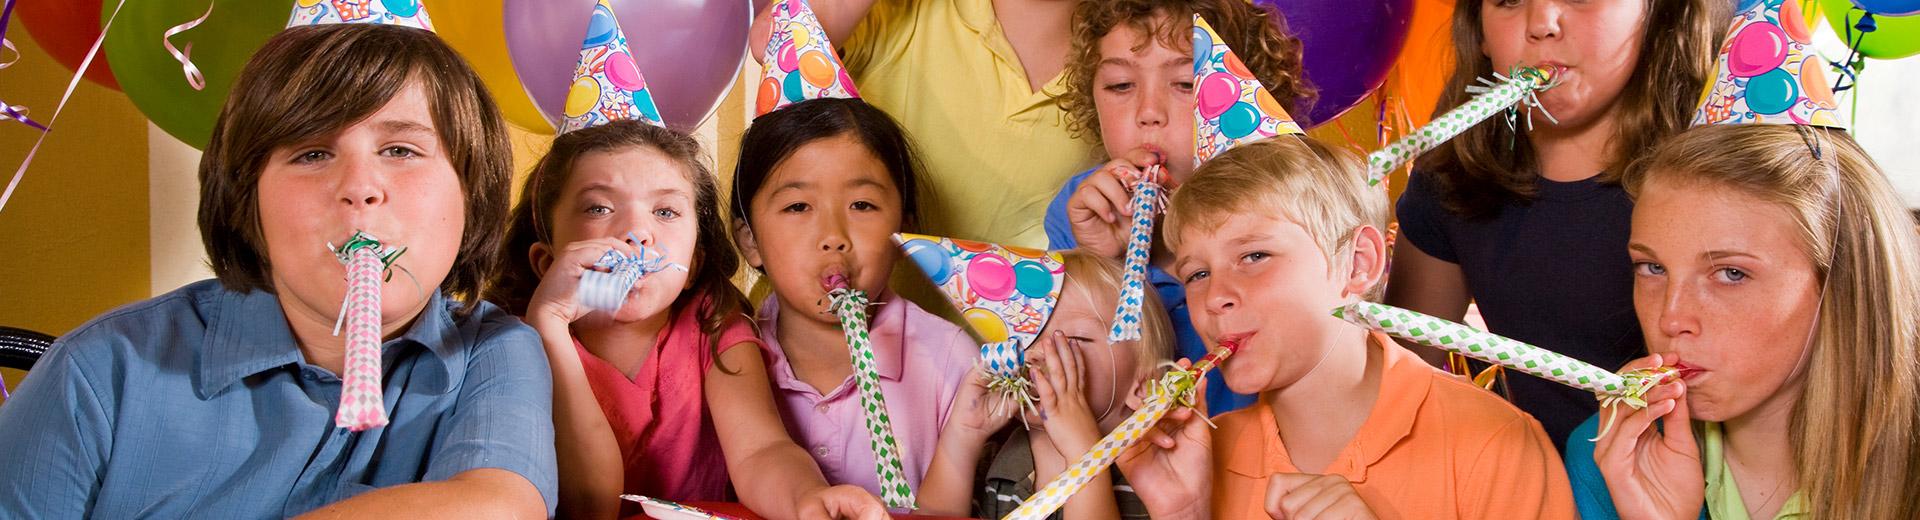 Birthday Parties | Adventure Landing Family Entertainment Center | Buffalo, NY